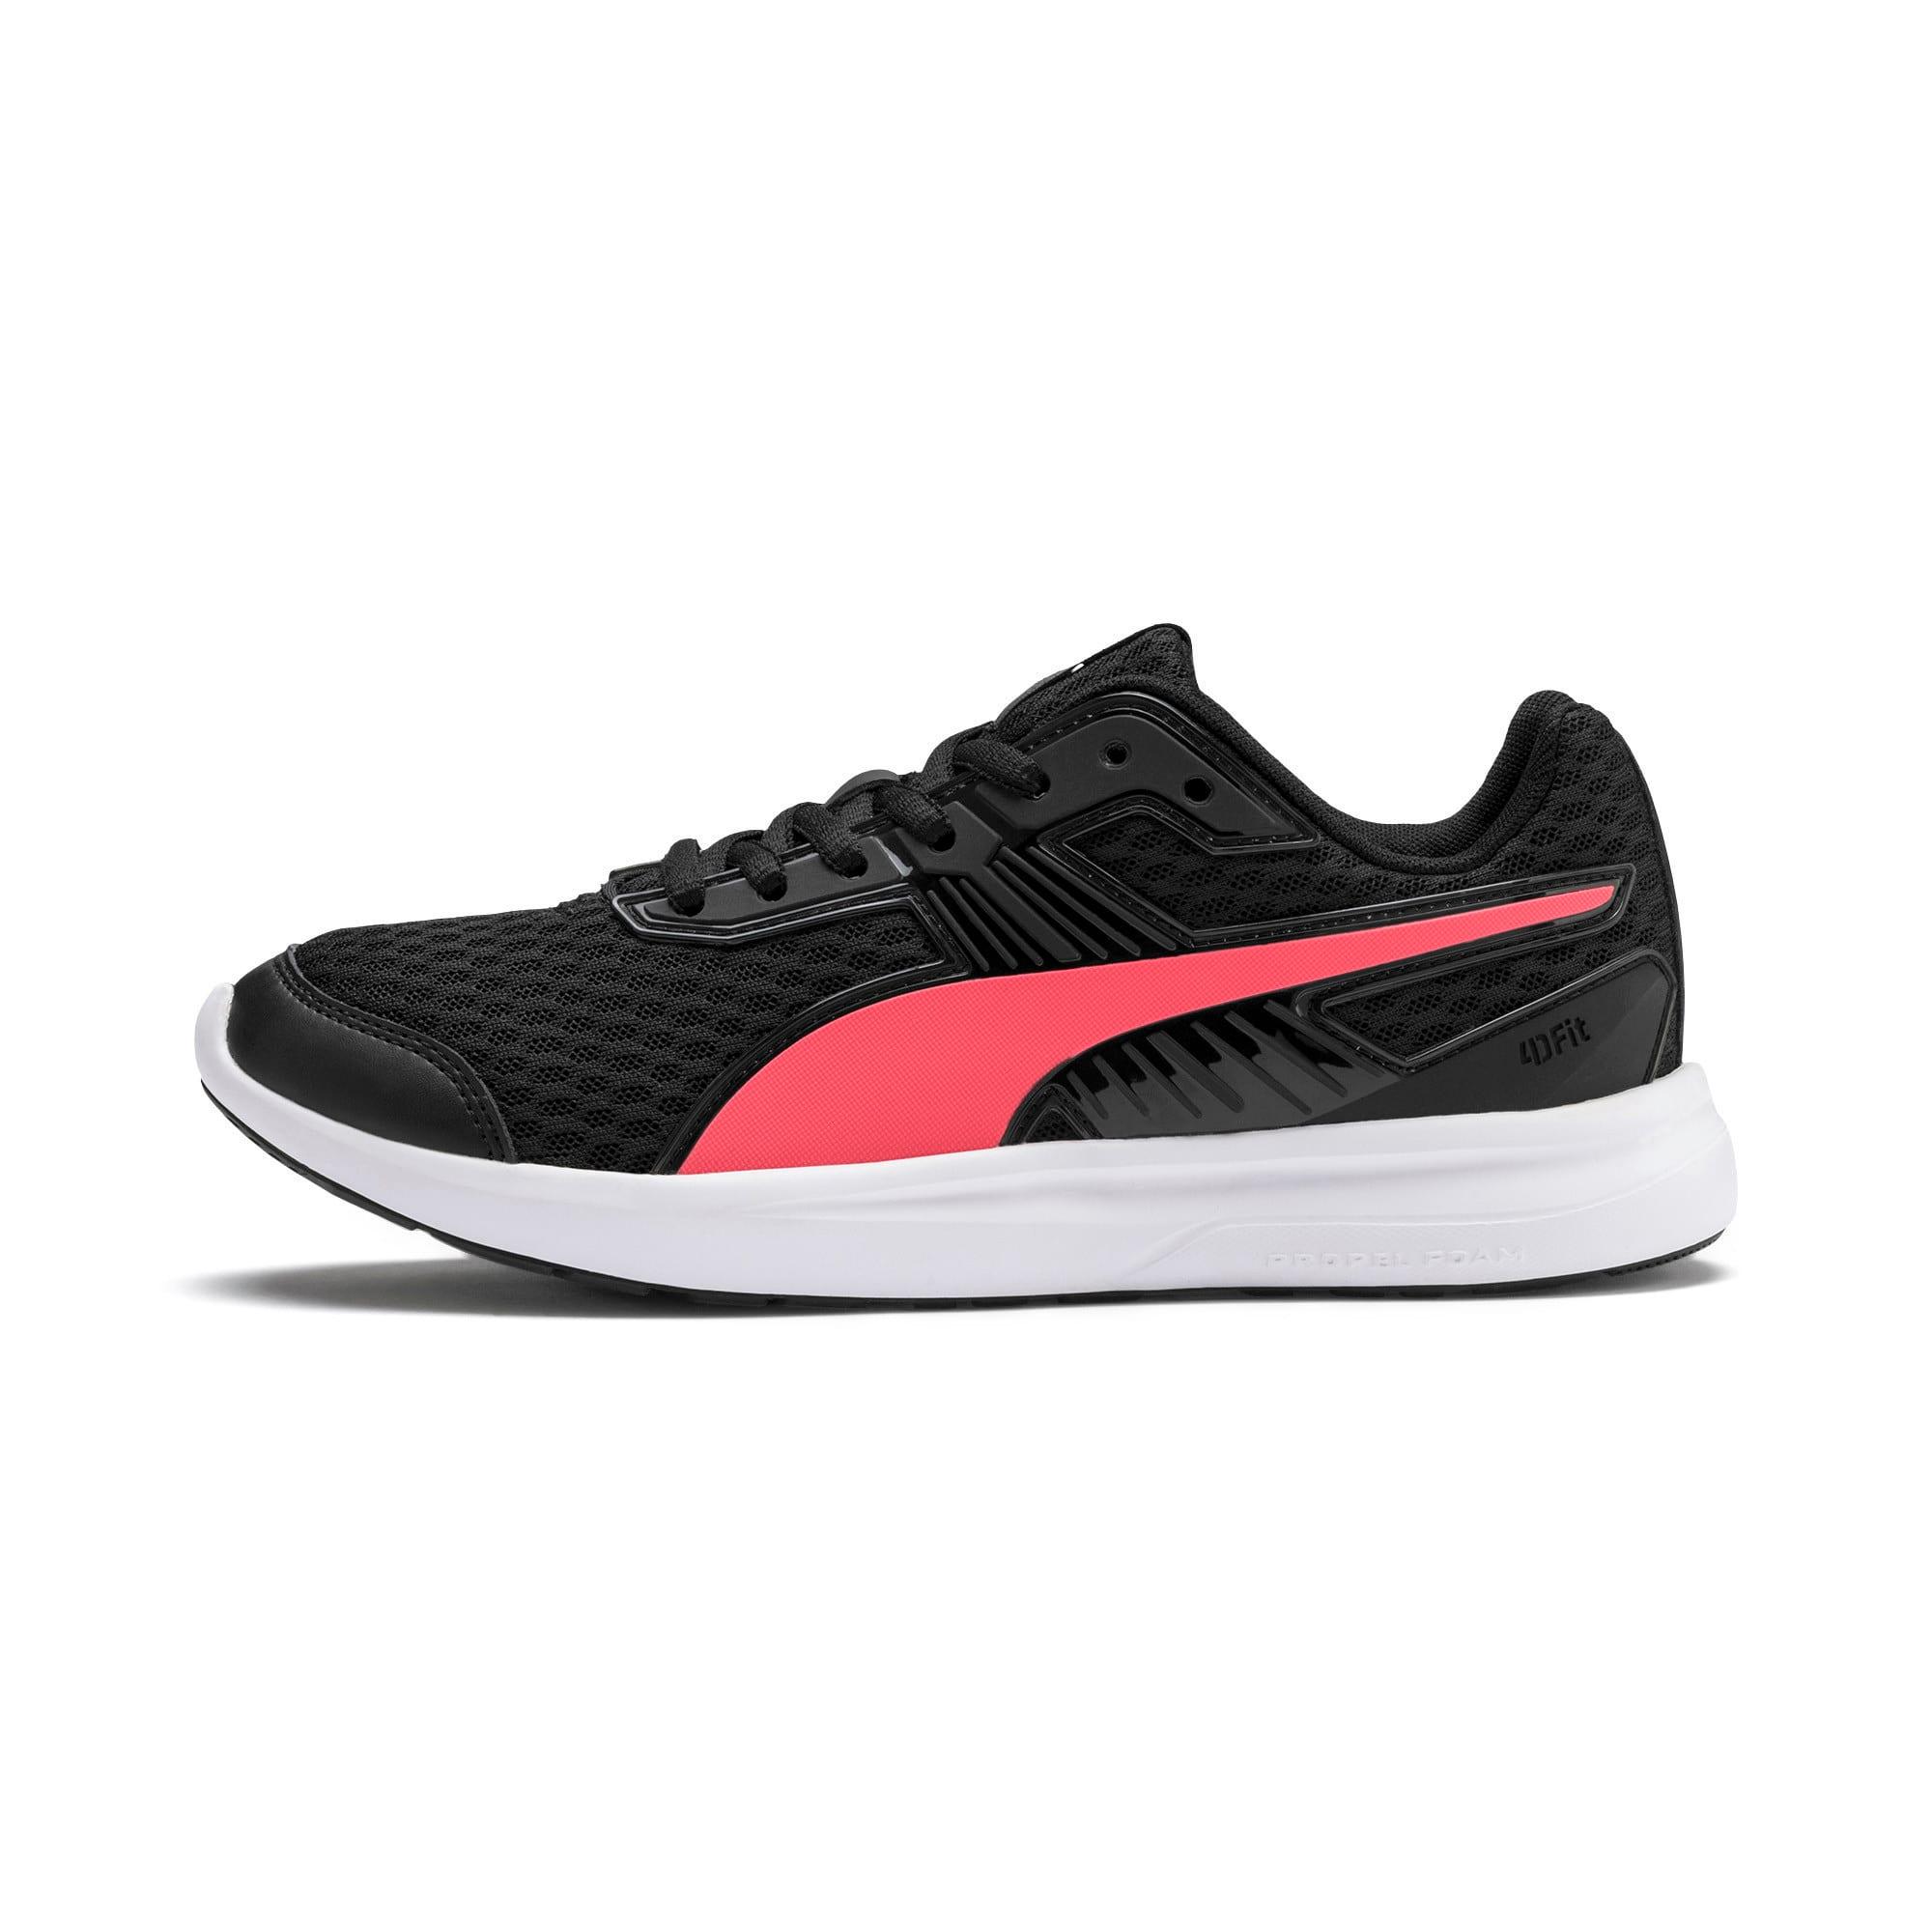 Thumbnail 1 of Escaper Pro Training Shoes, Black-Calypso Coral-White, medium-IND